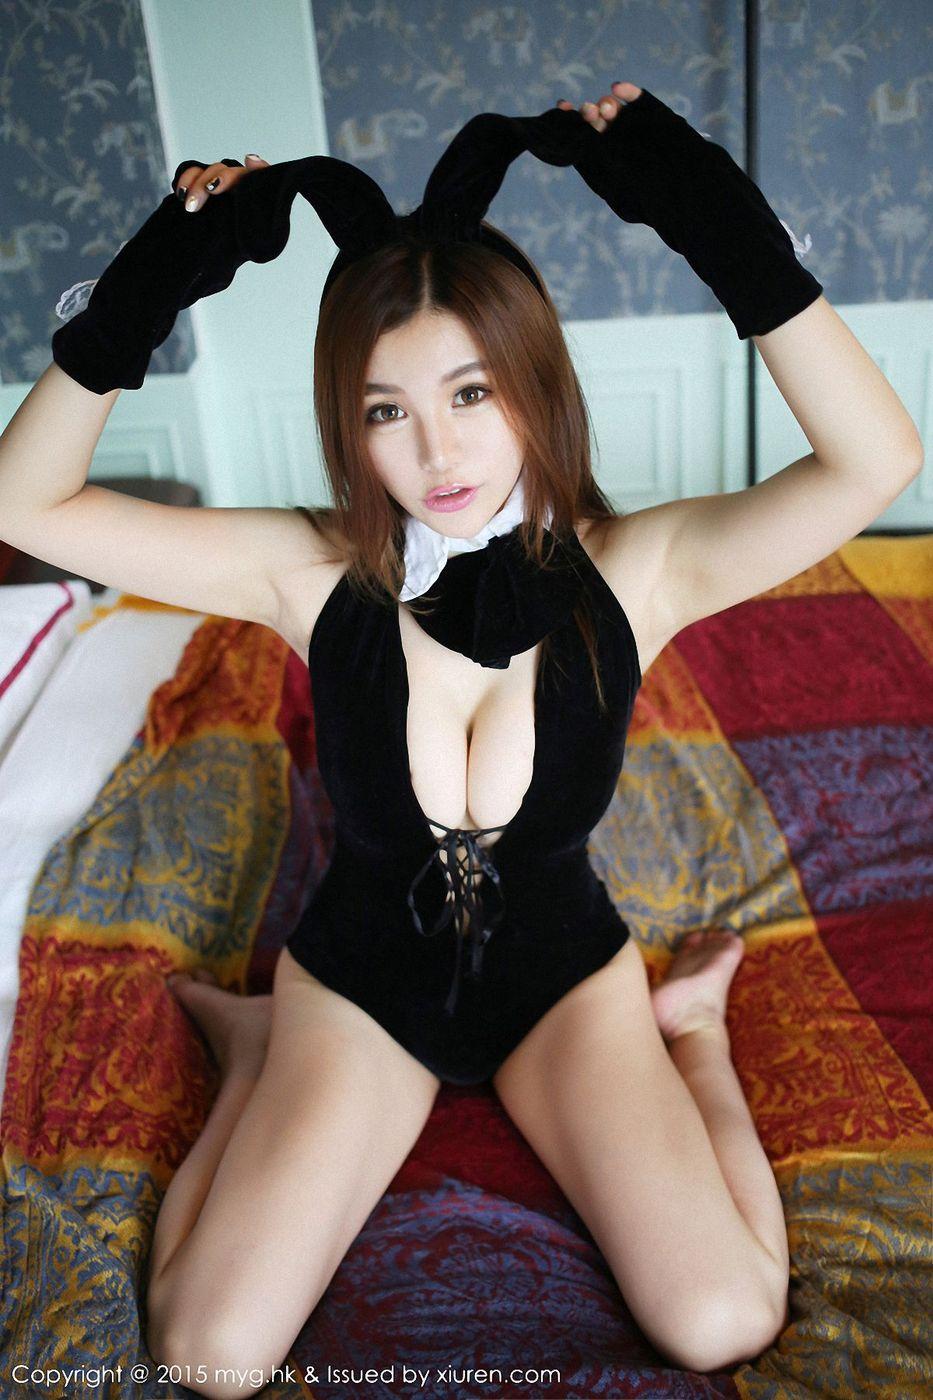 [MyGirl美媛馆] 性感女神刘娅希COSPLAY兔女郎黑色内衣诱惑写真集 Vol.145